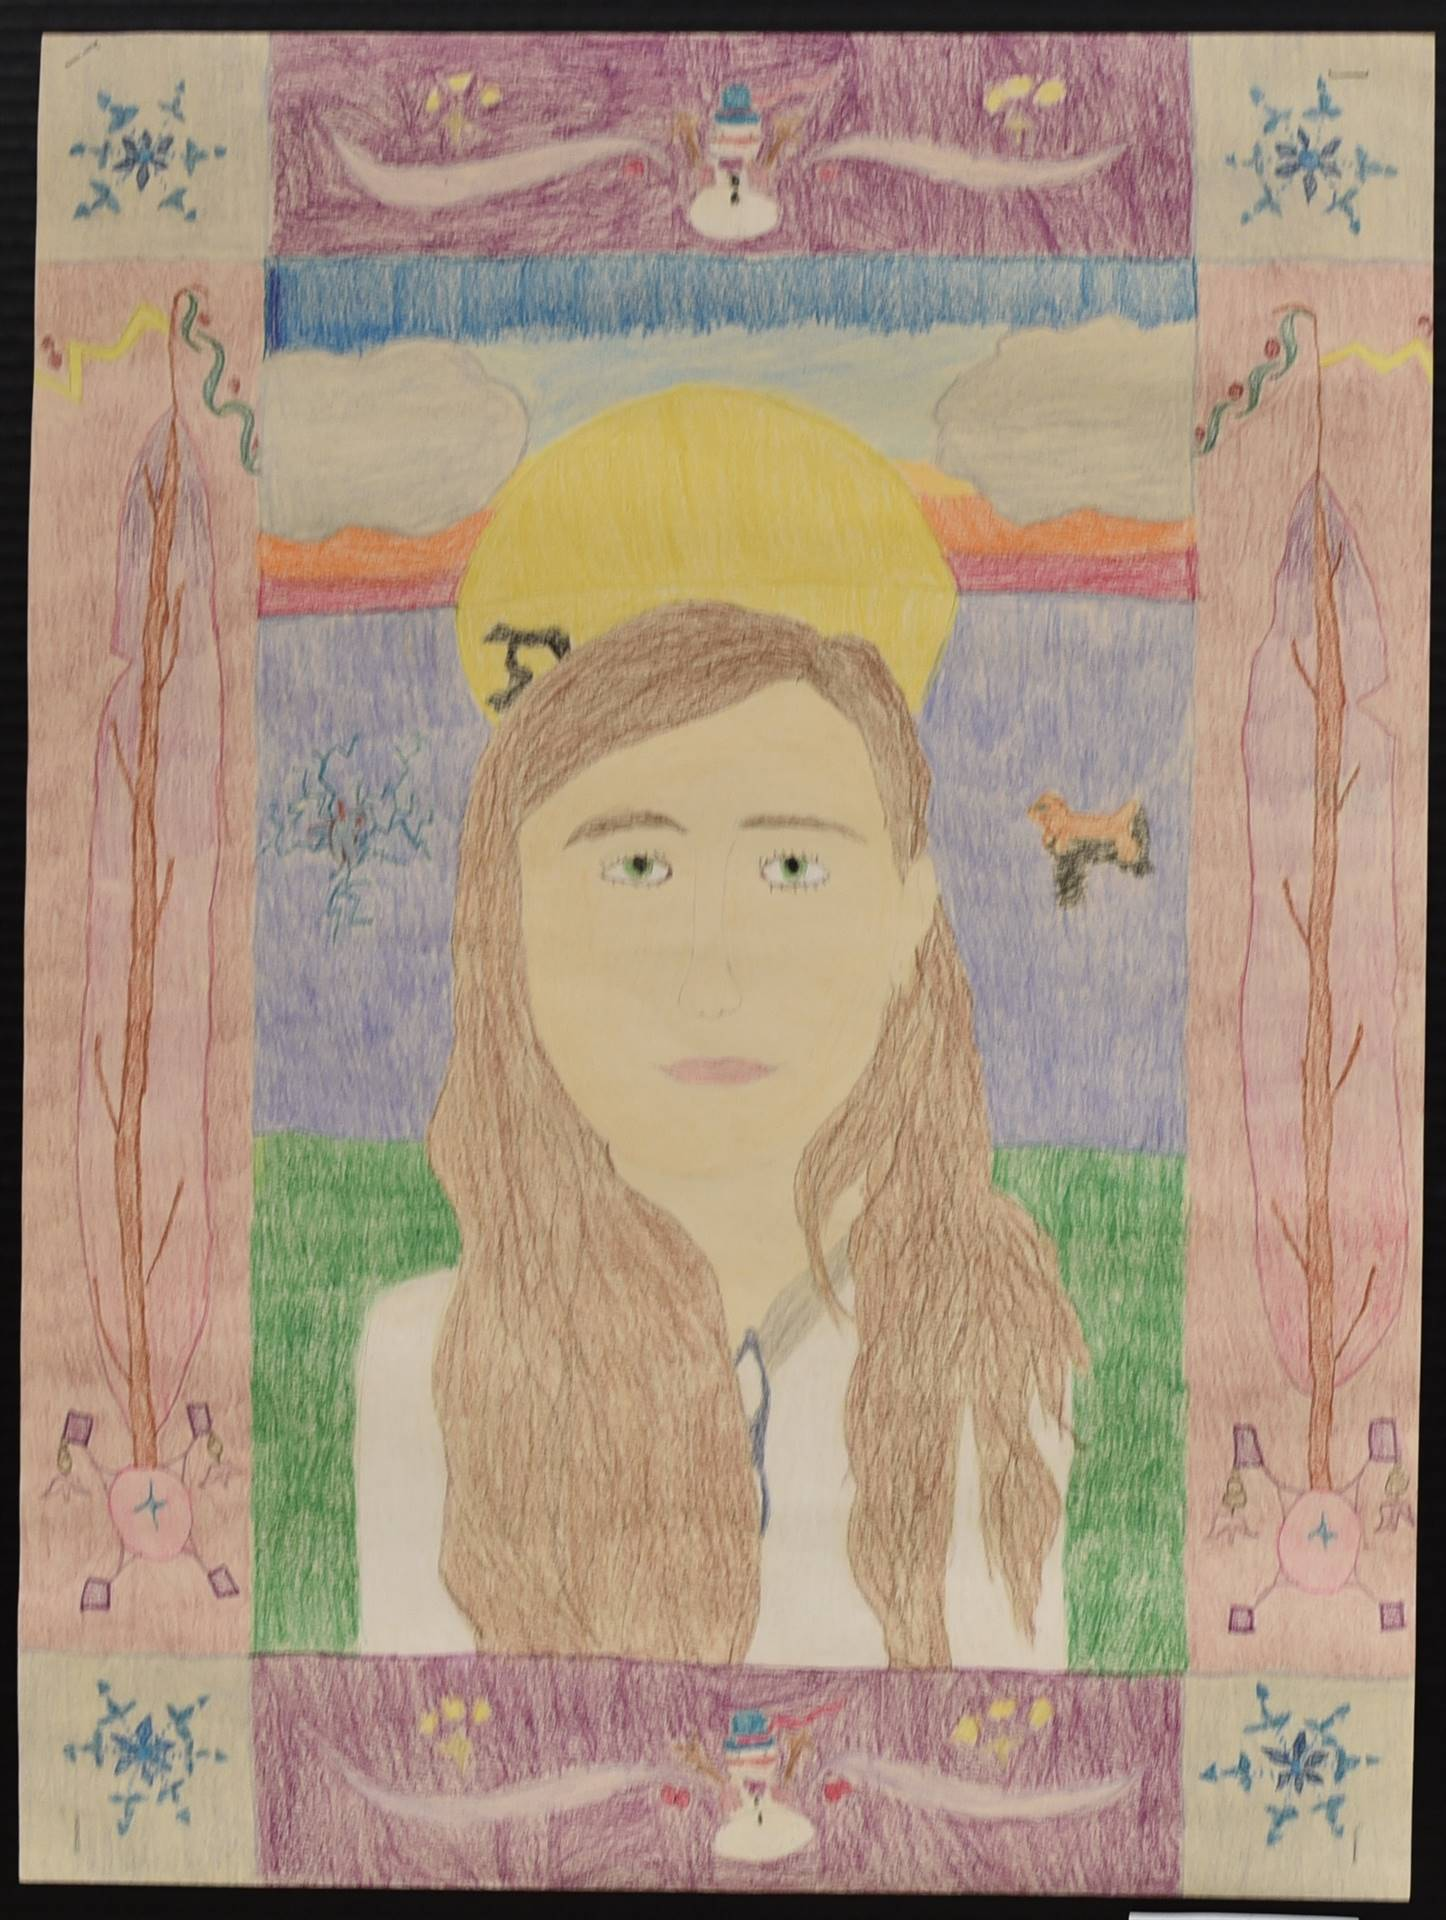 Brecksville-Broadview Hts. Middle School Art Projects 155